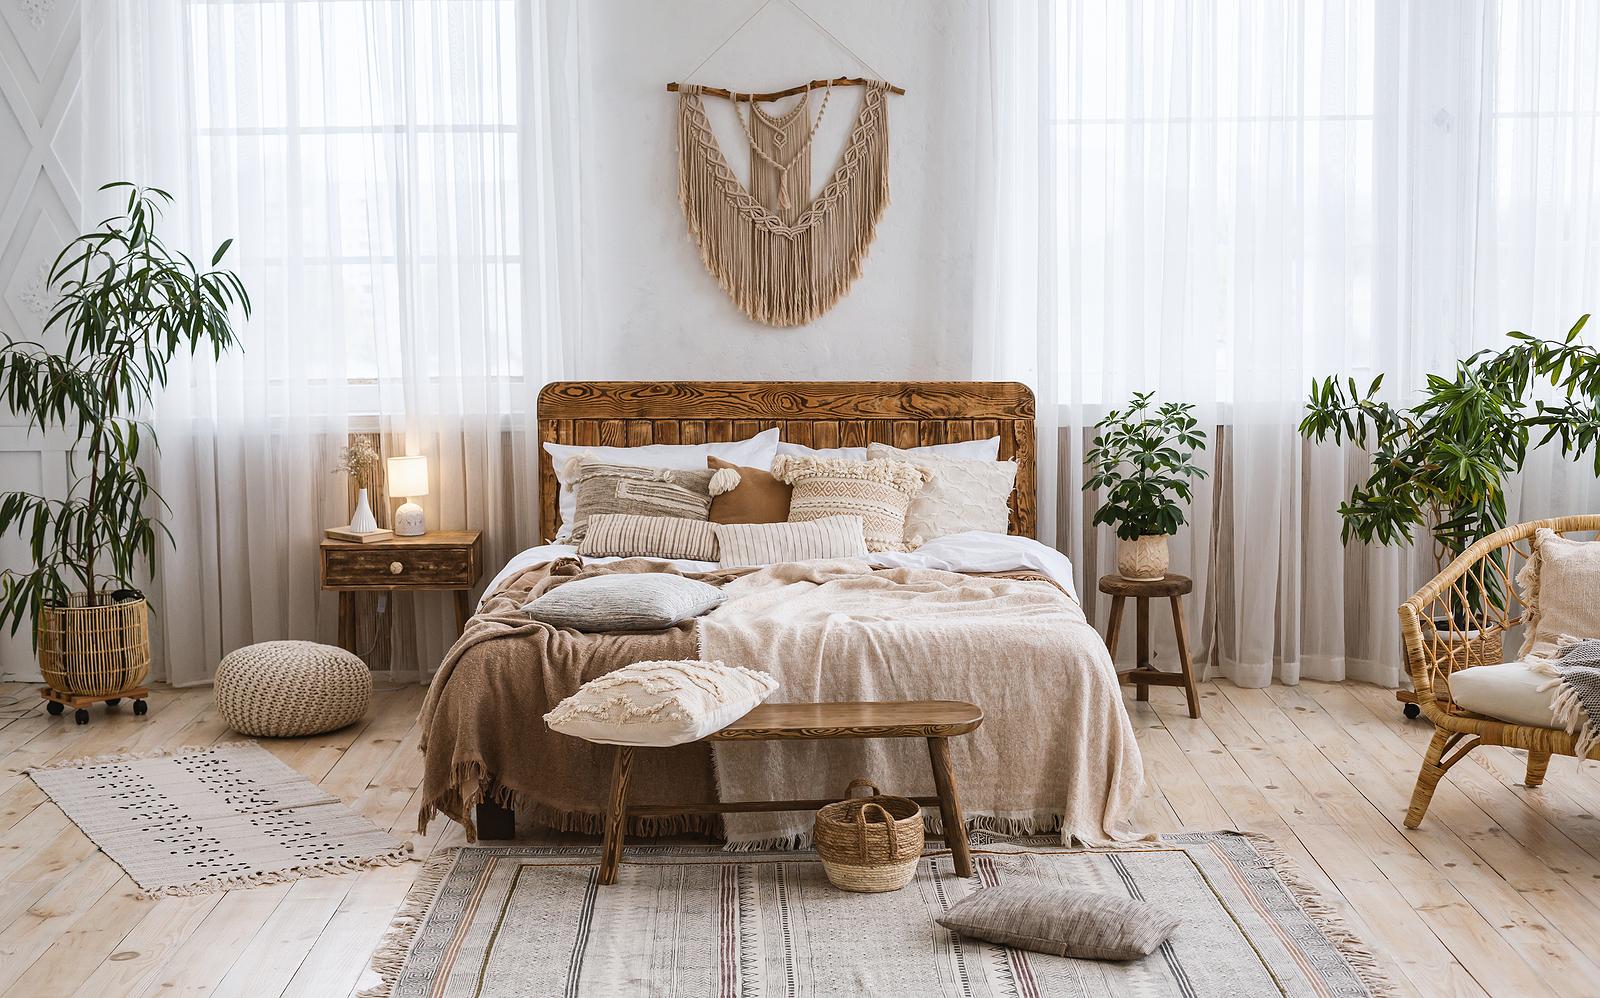 dw-semana-design-saopaulo-2021-wgsn-tendencias-morar-casa-arquitetura-decoracao (6)